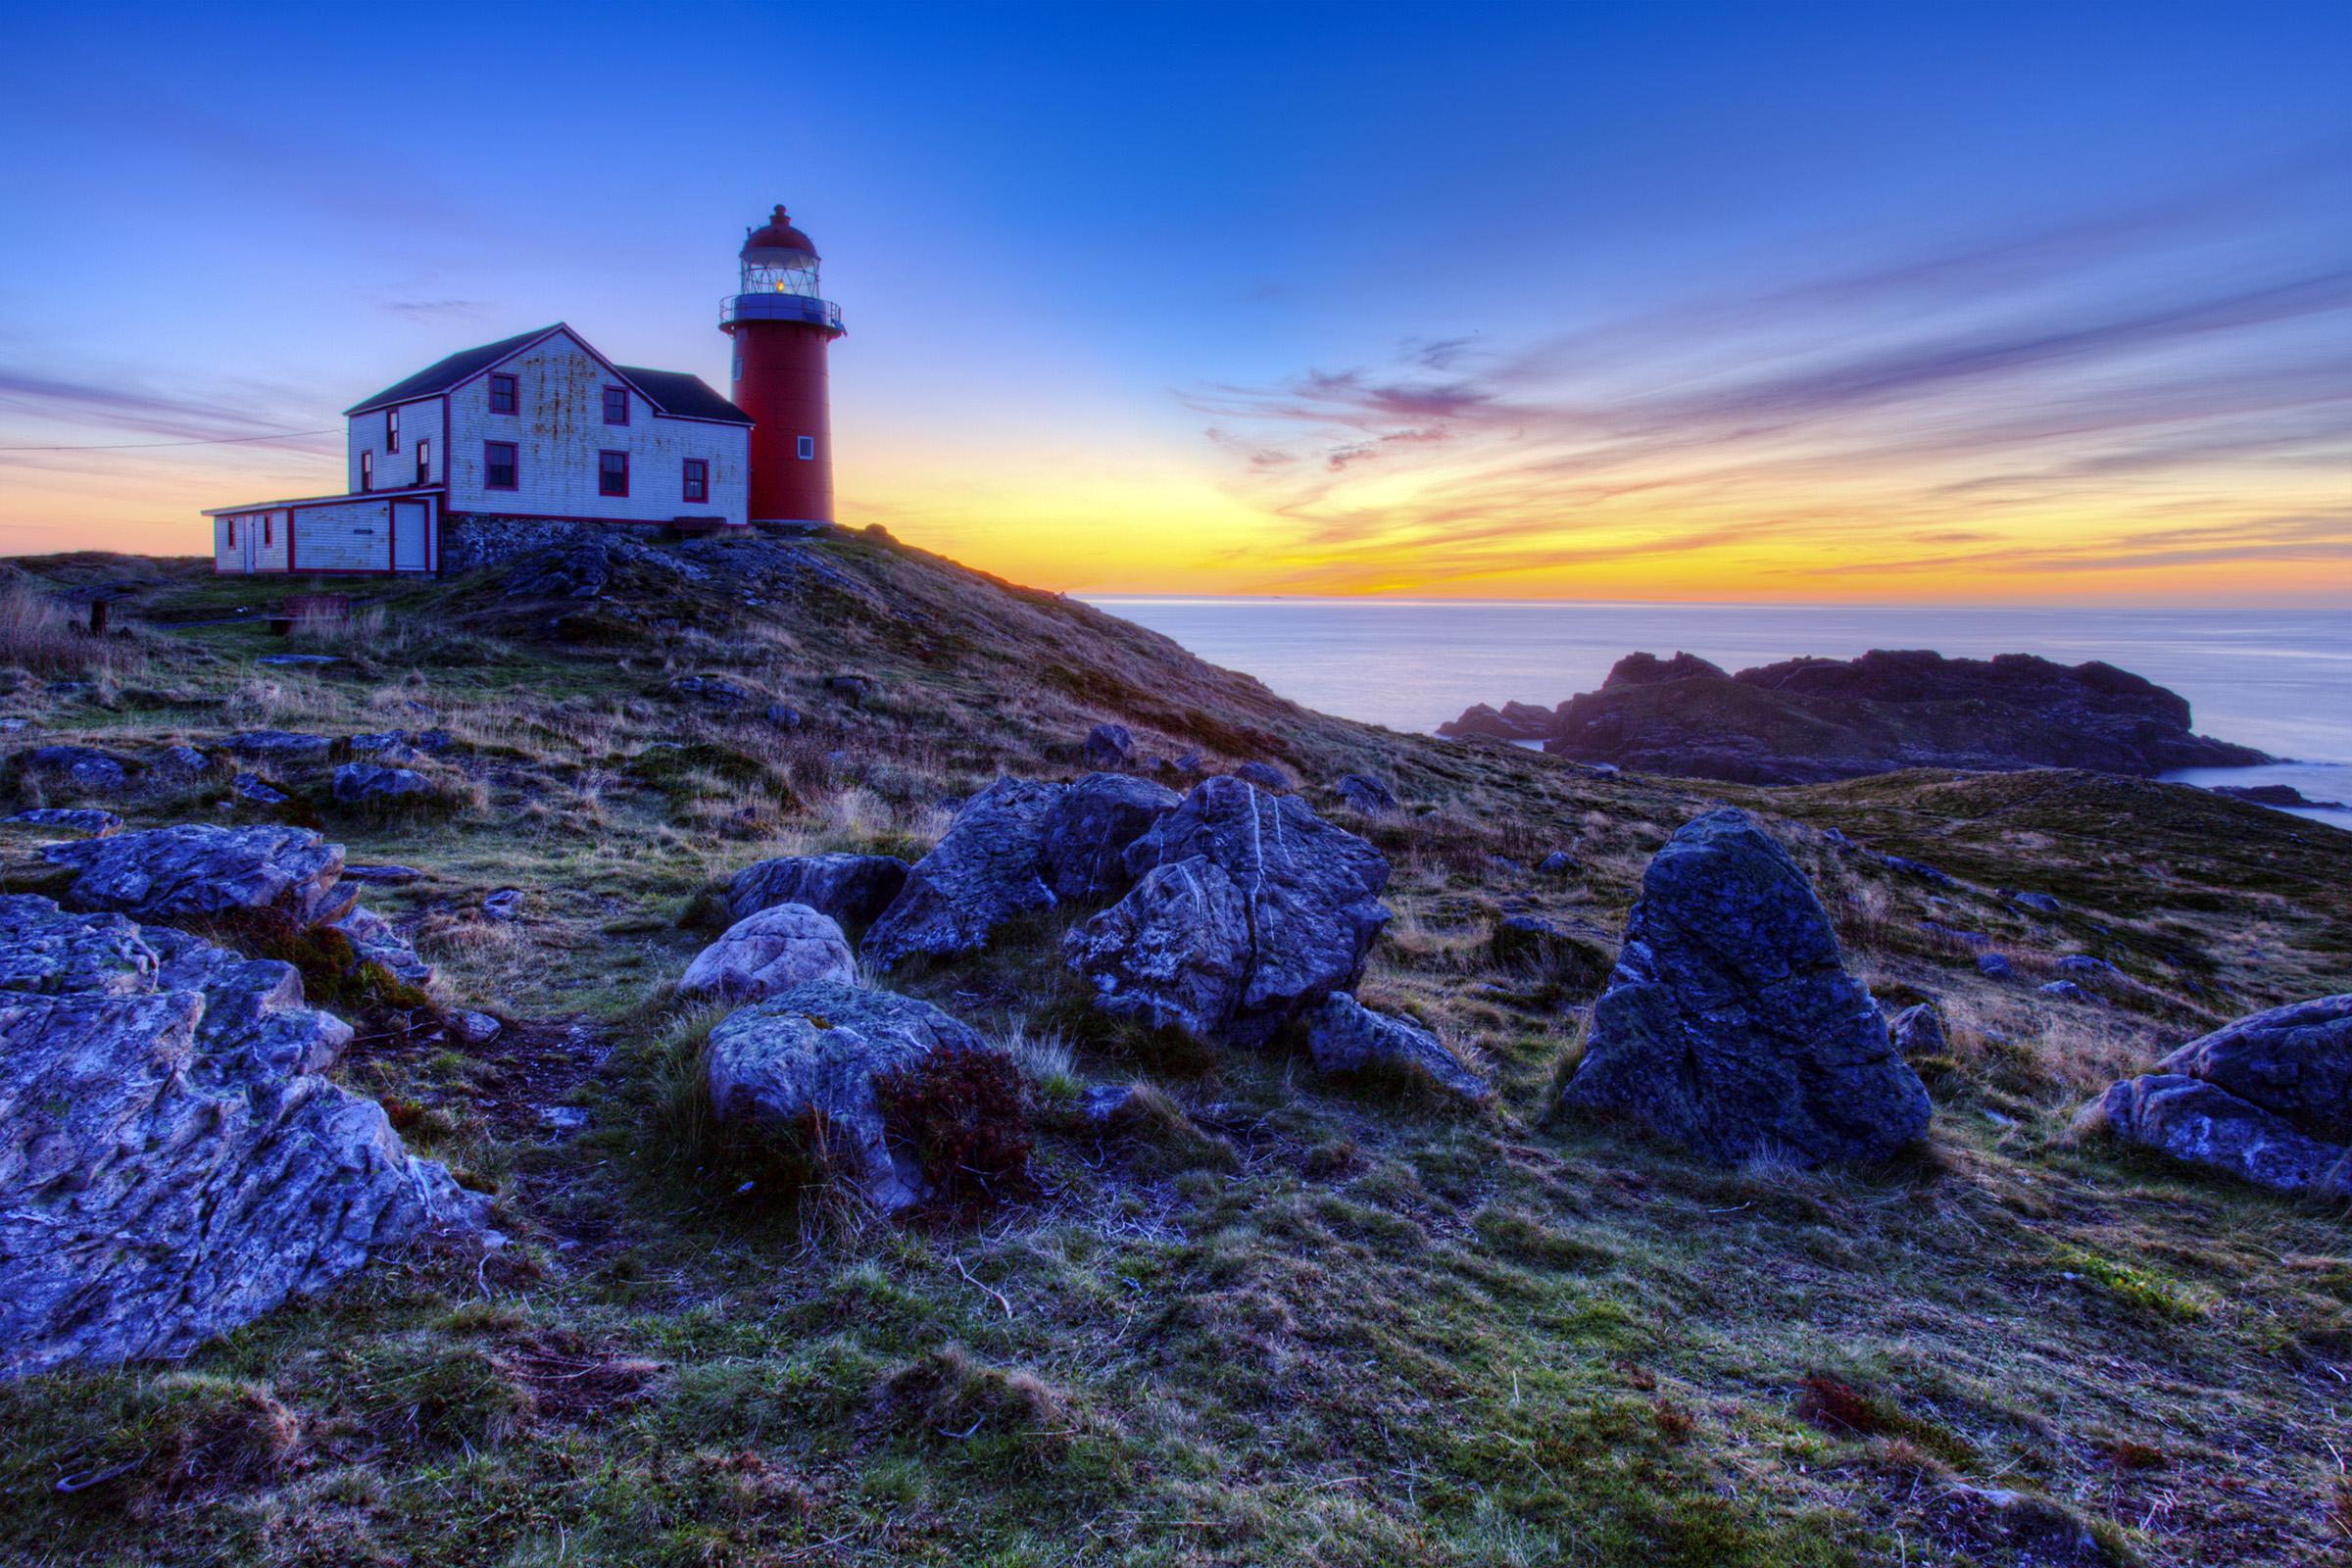 Lighthouse, Alert, Signal, Path, Power, HQ Photo